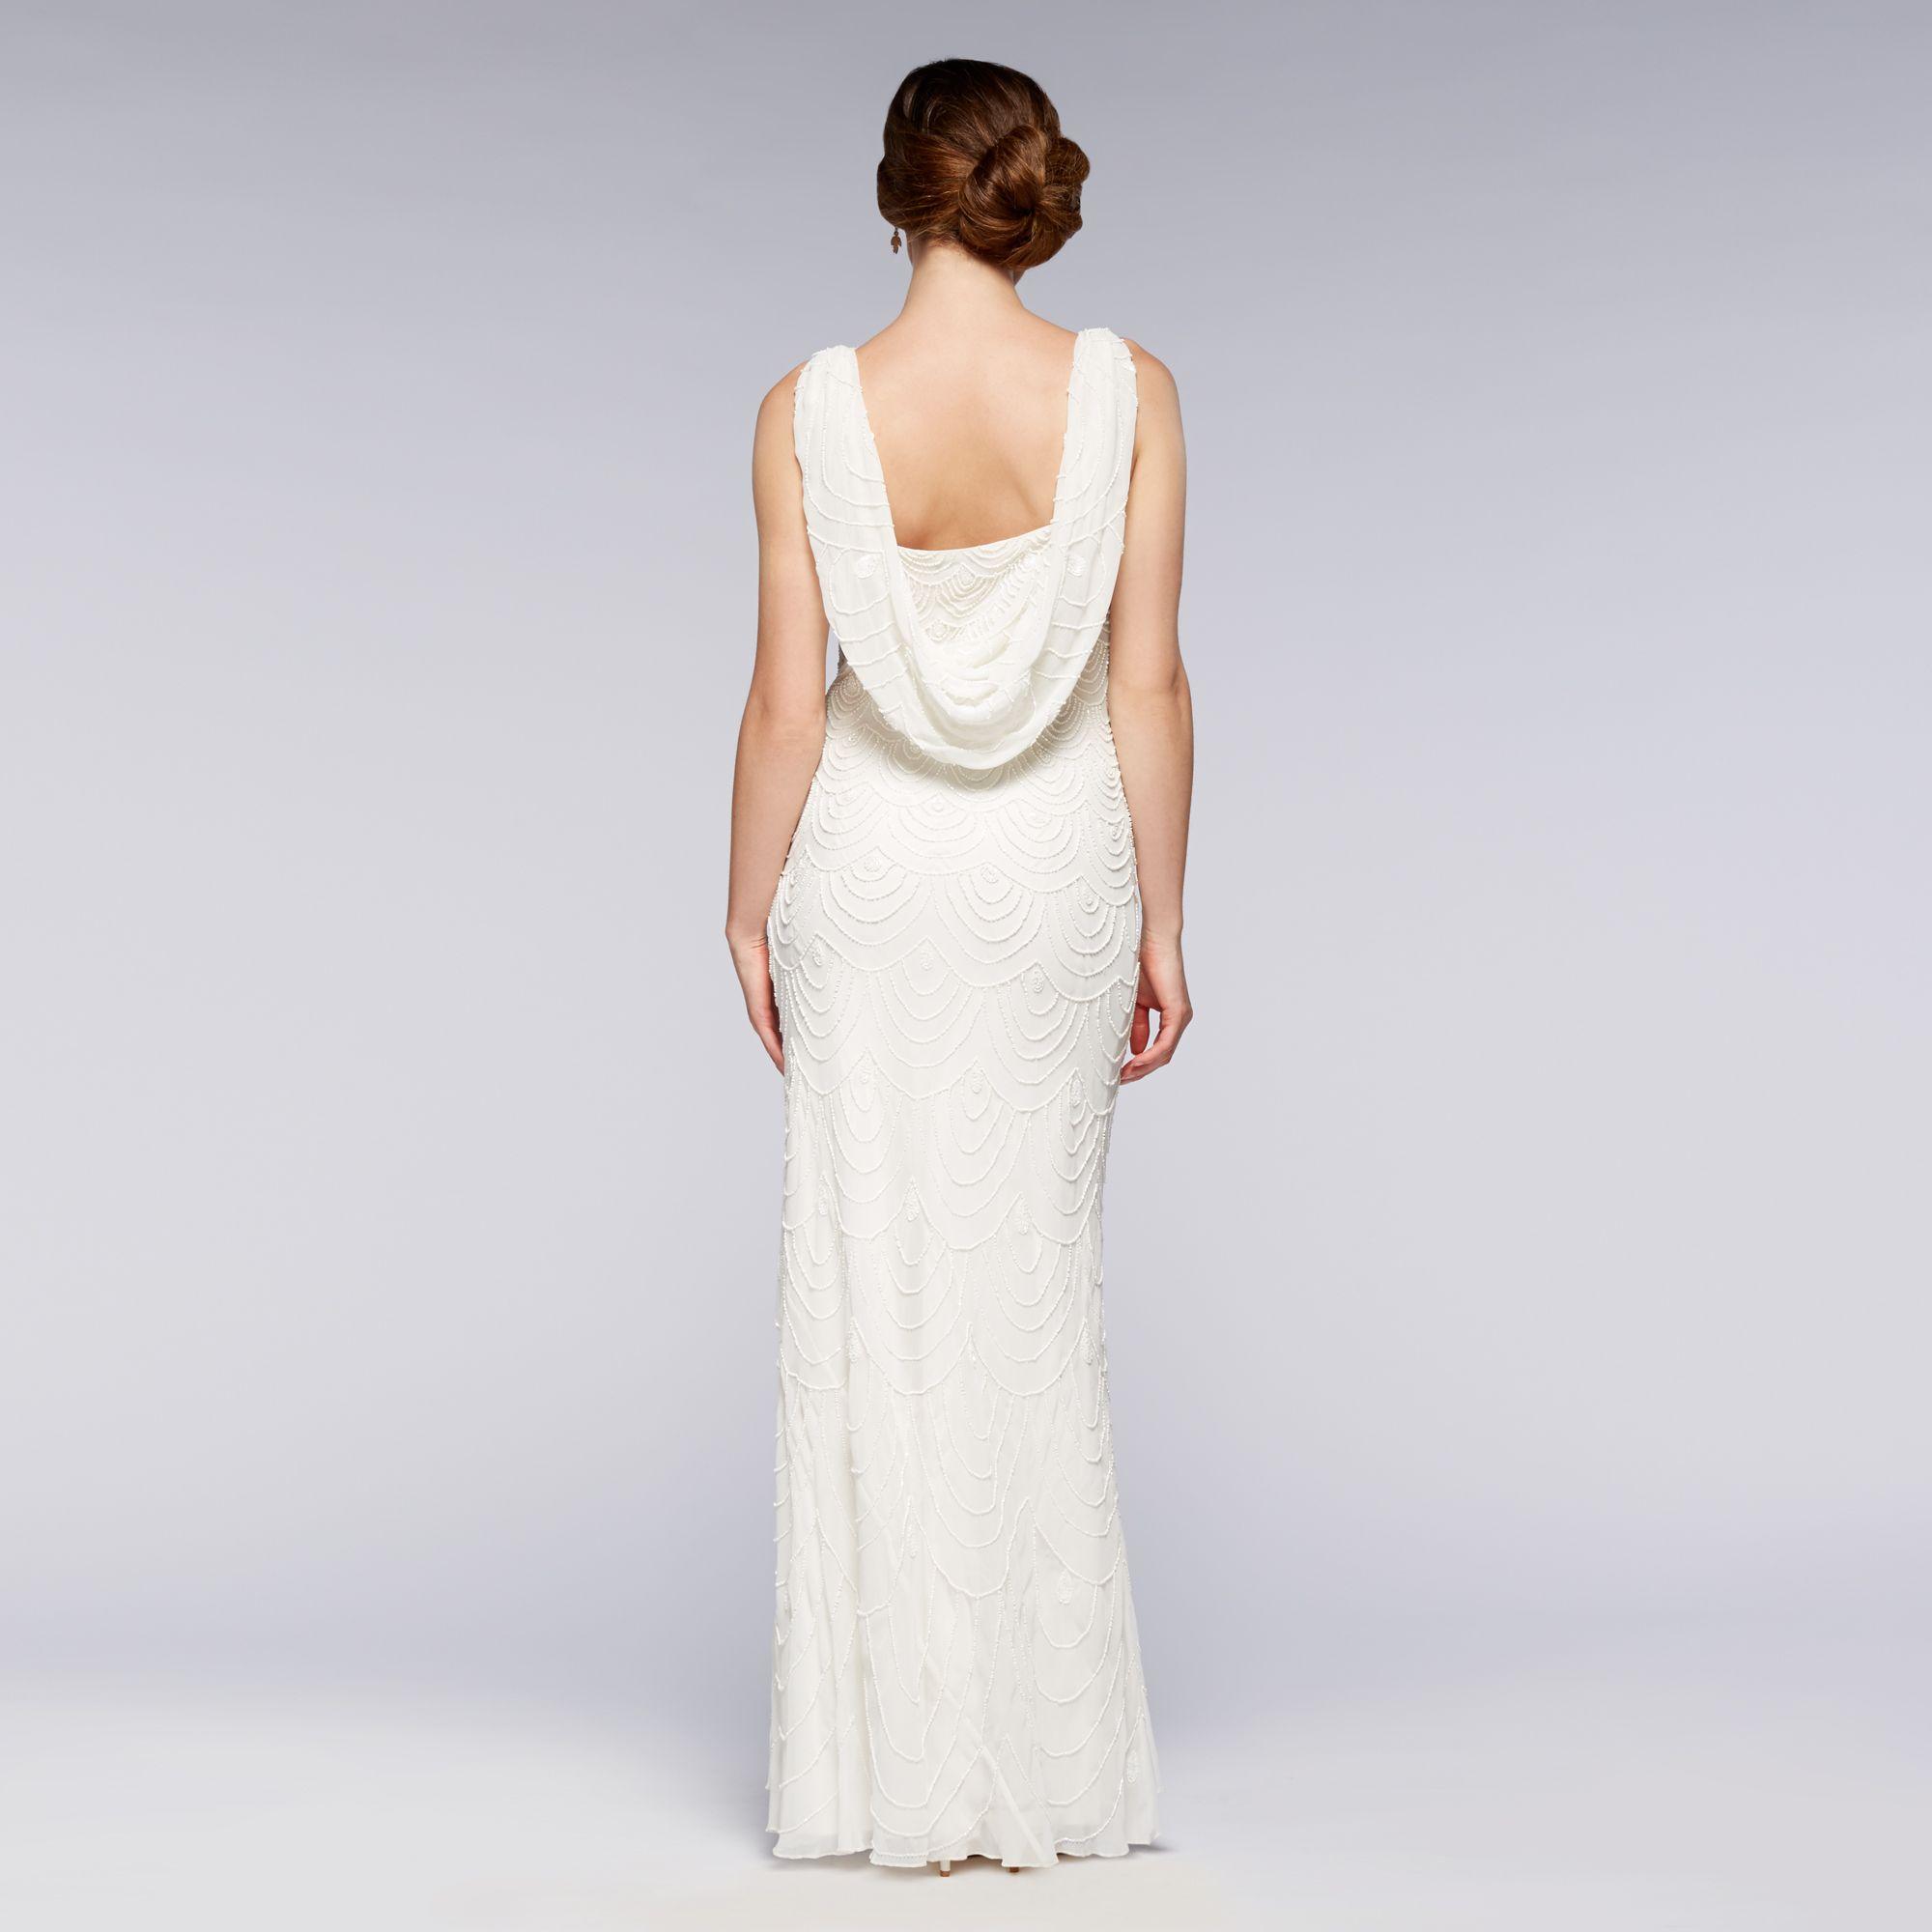 Wedding Dresses At Debenhams - Wedding Dresses In Jax